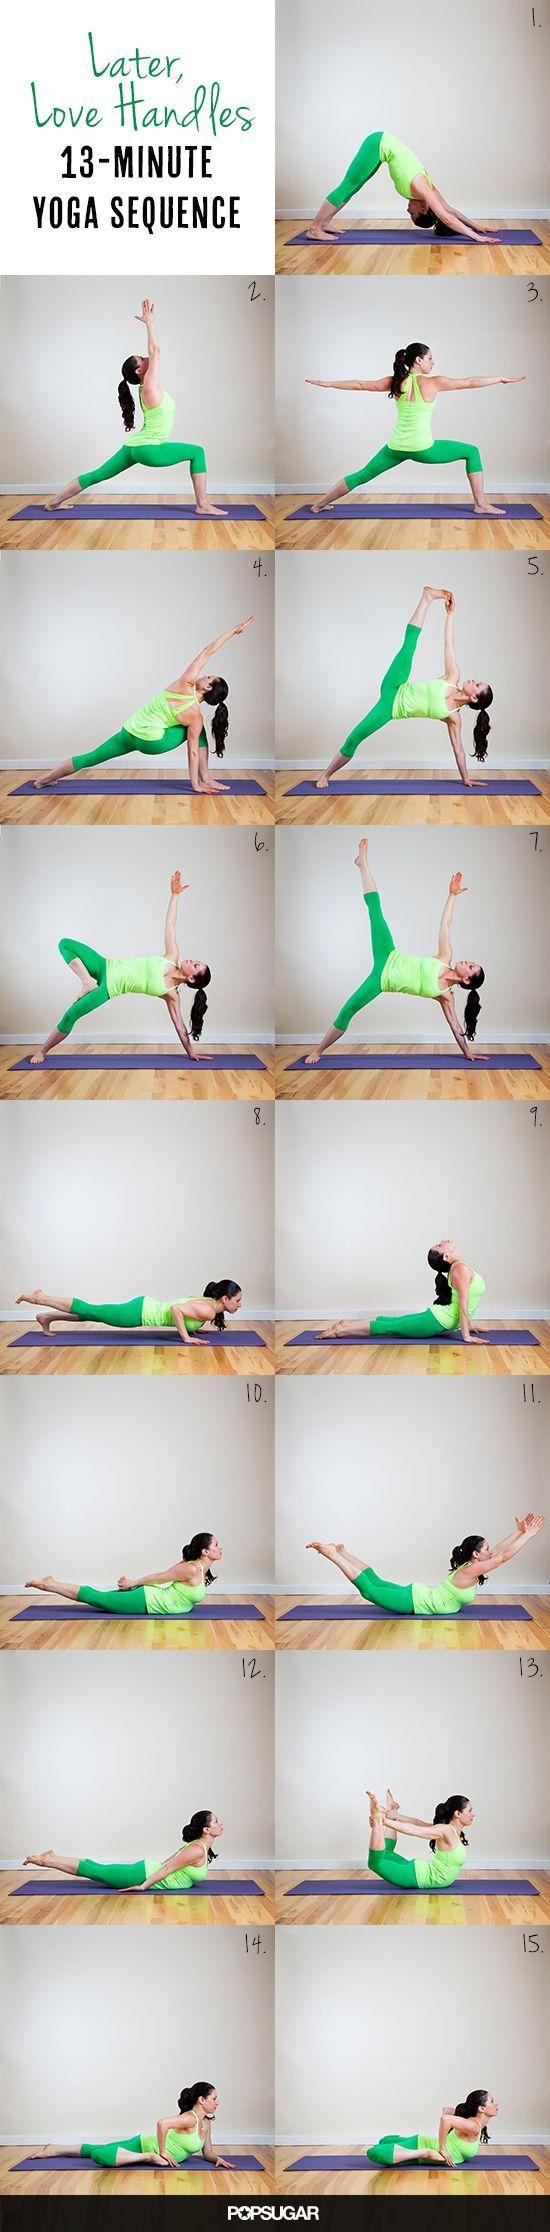 Love Handles Yoga Sequence